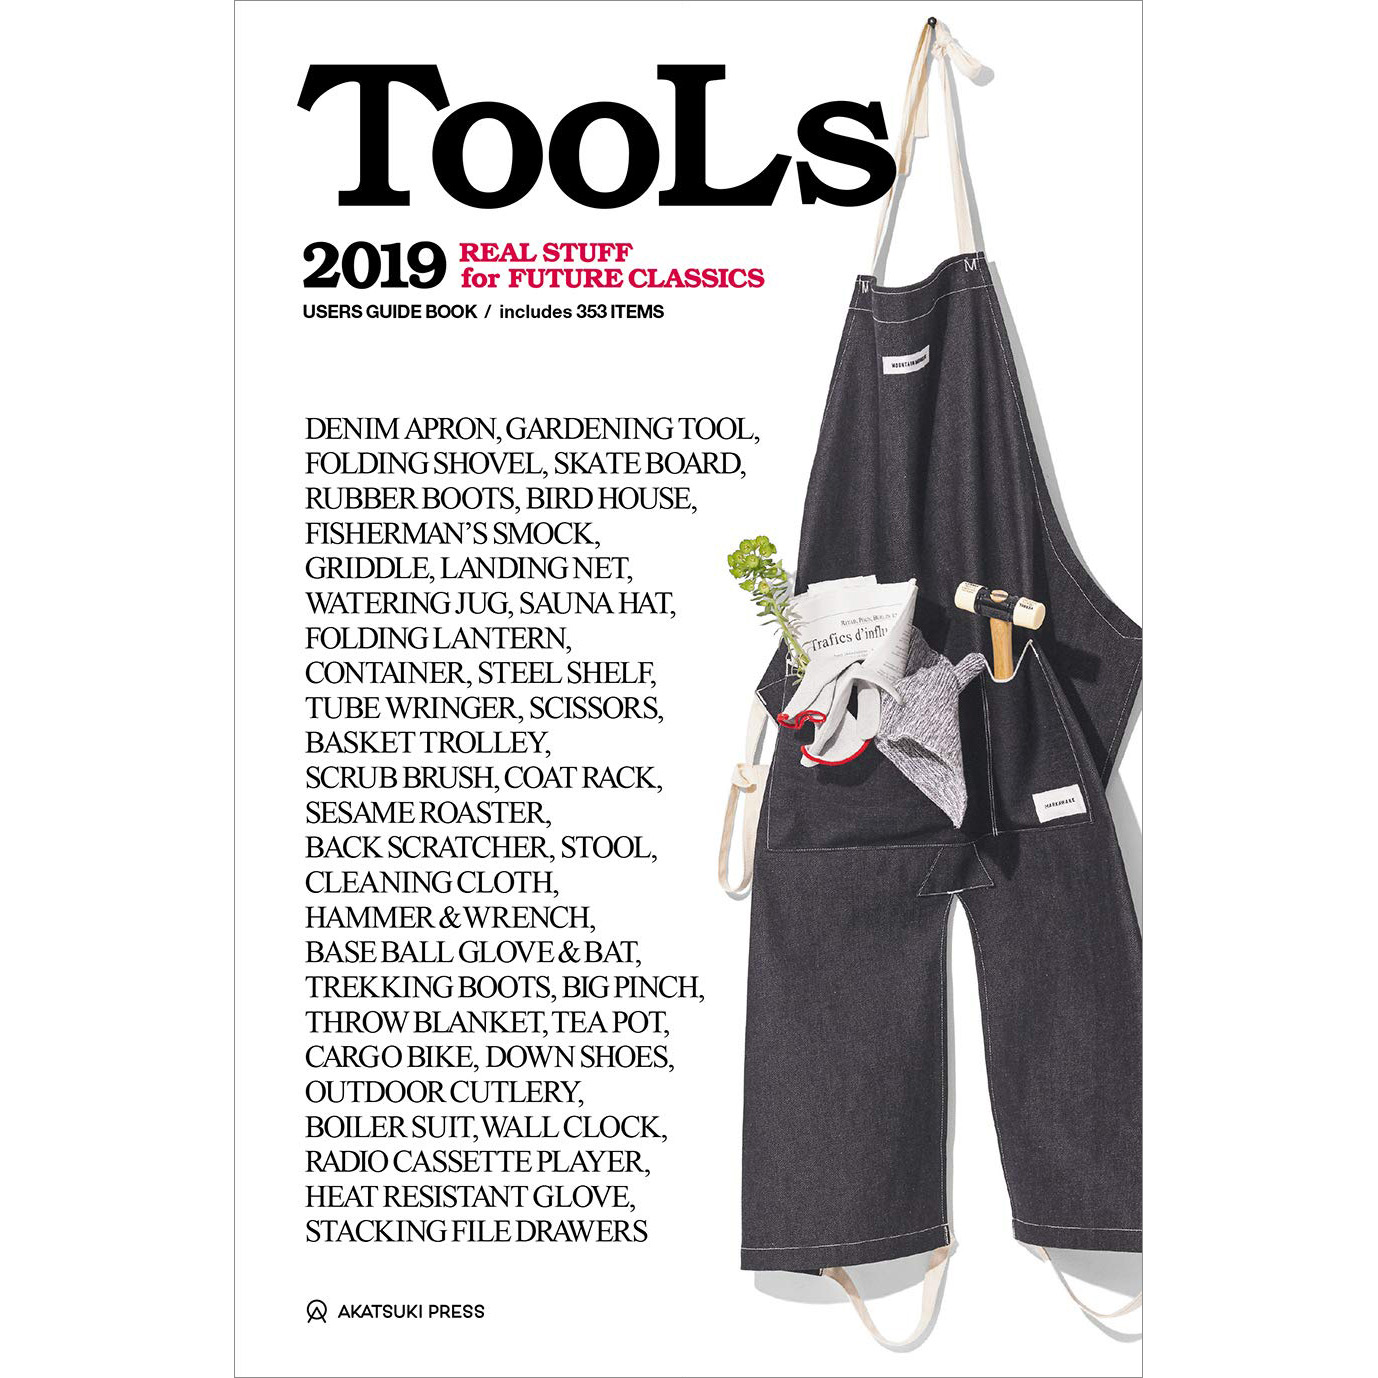 Tools 2019 - Real Stuff For Future Classics